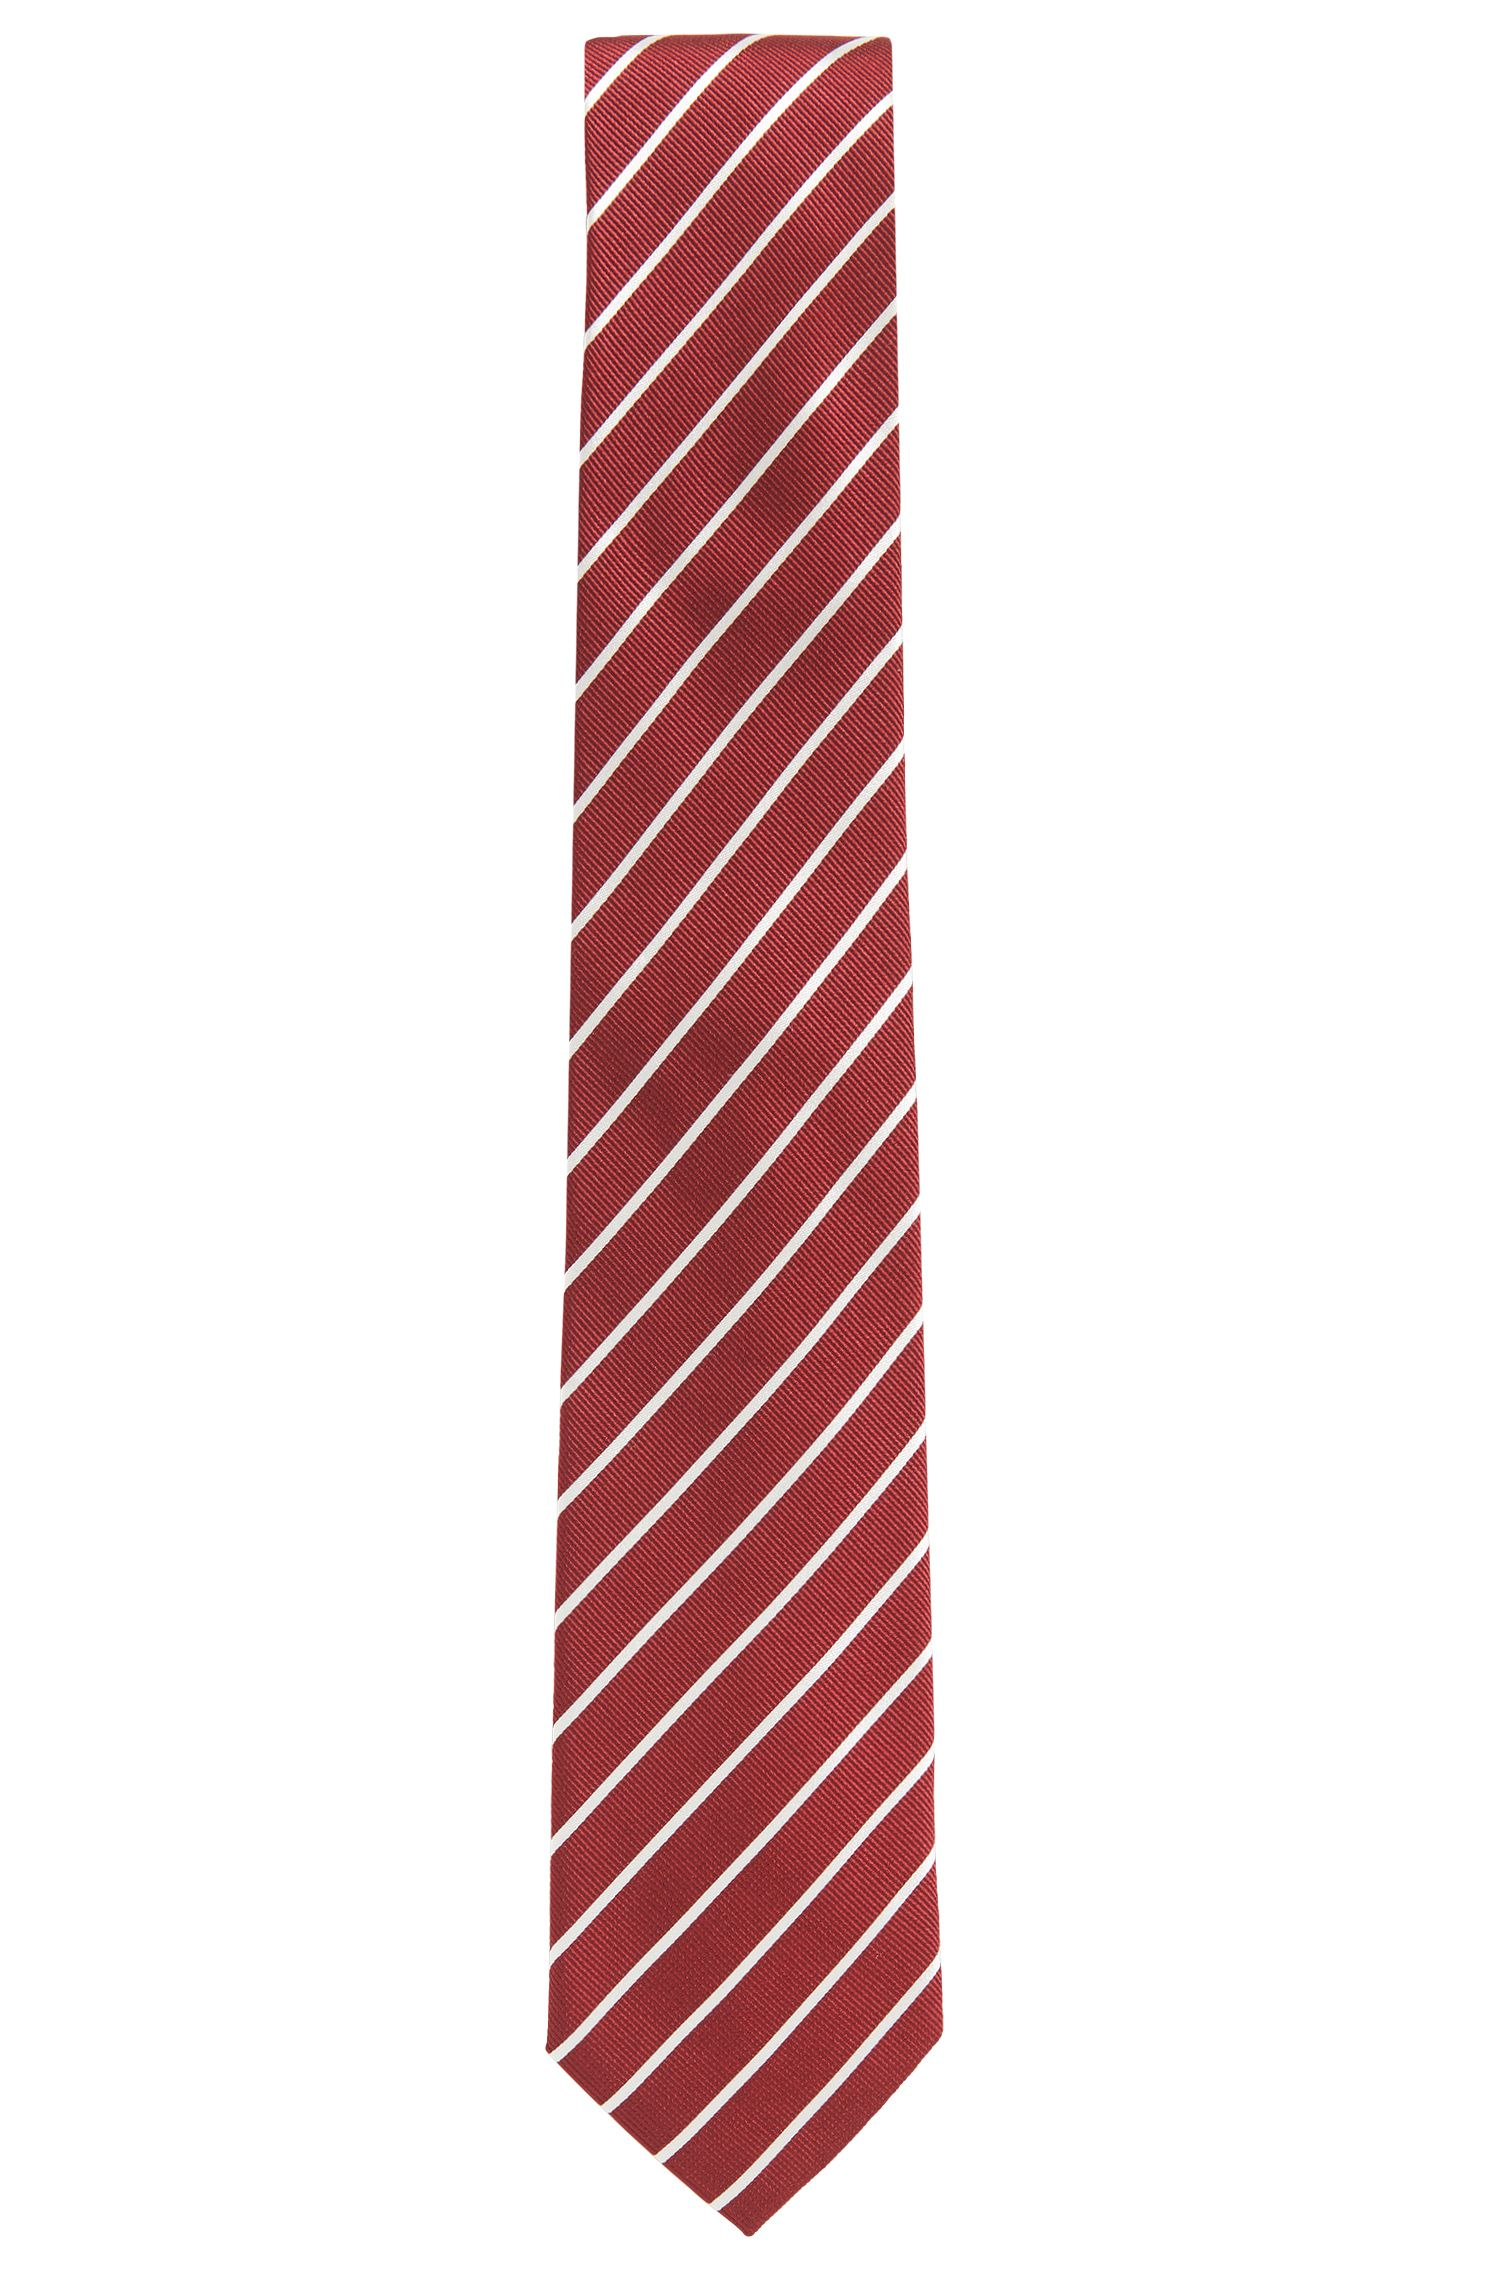 Cravatta a righe in seta jacquard